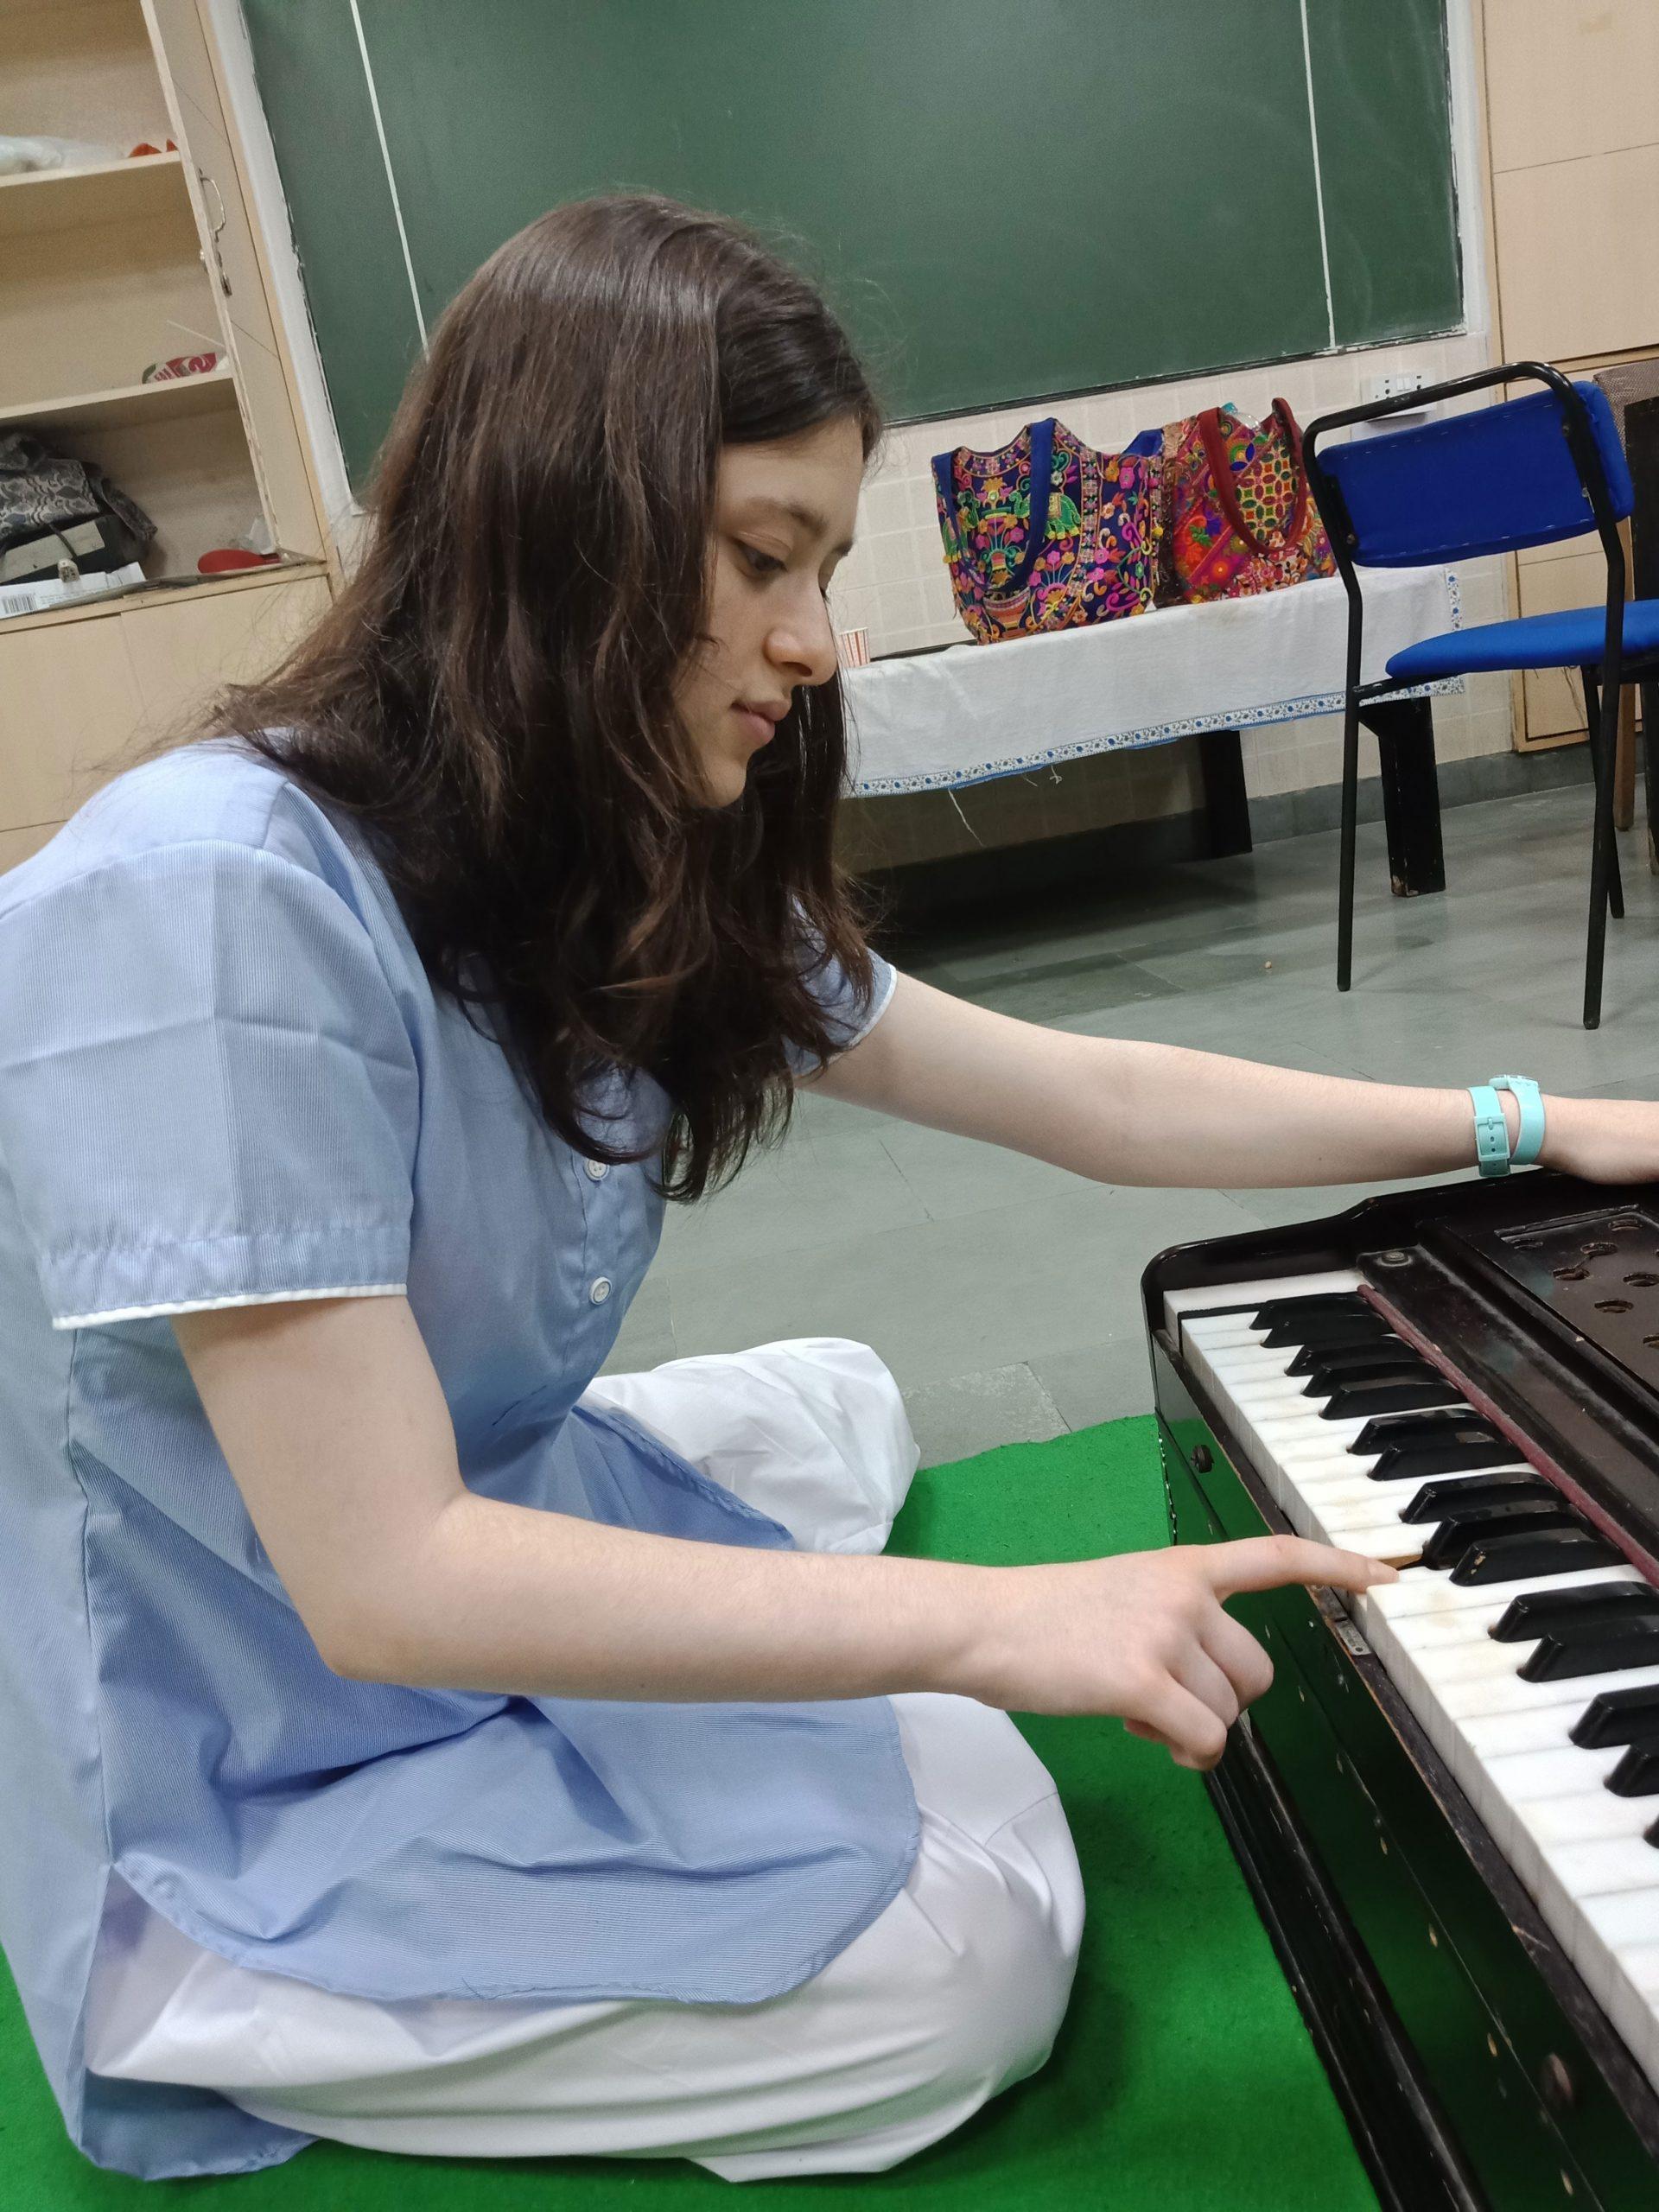 INTERNATIONAL STUDENT LEARNING TO PLAY  THE HARMONIUM